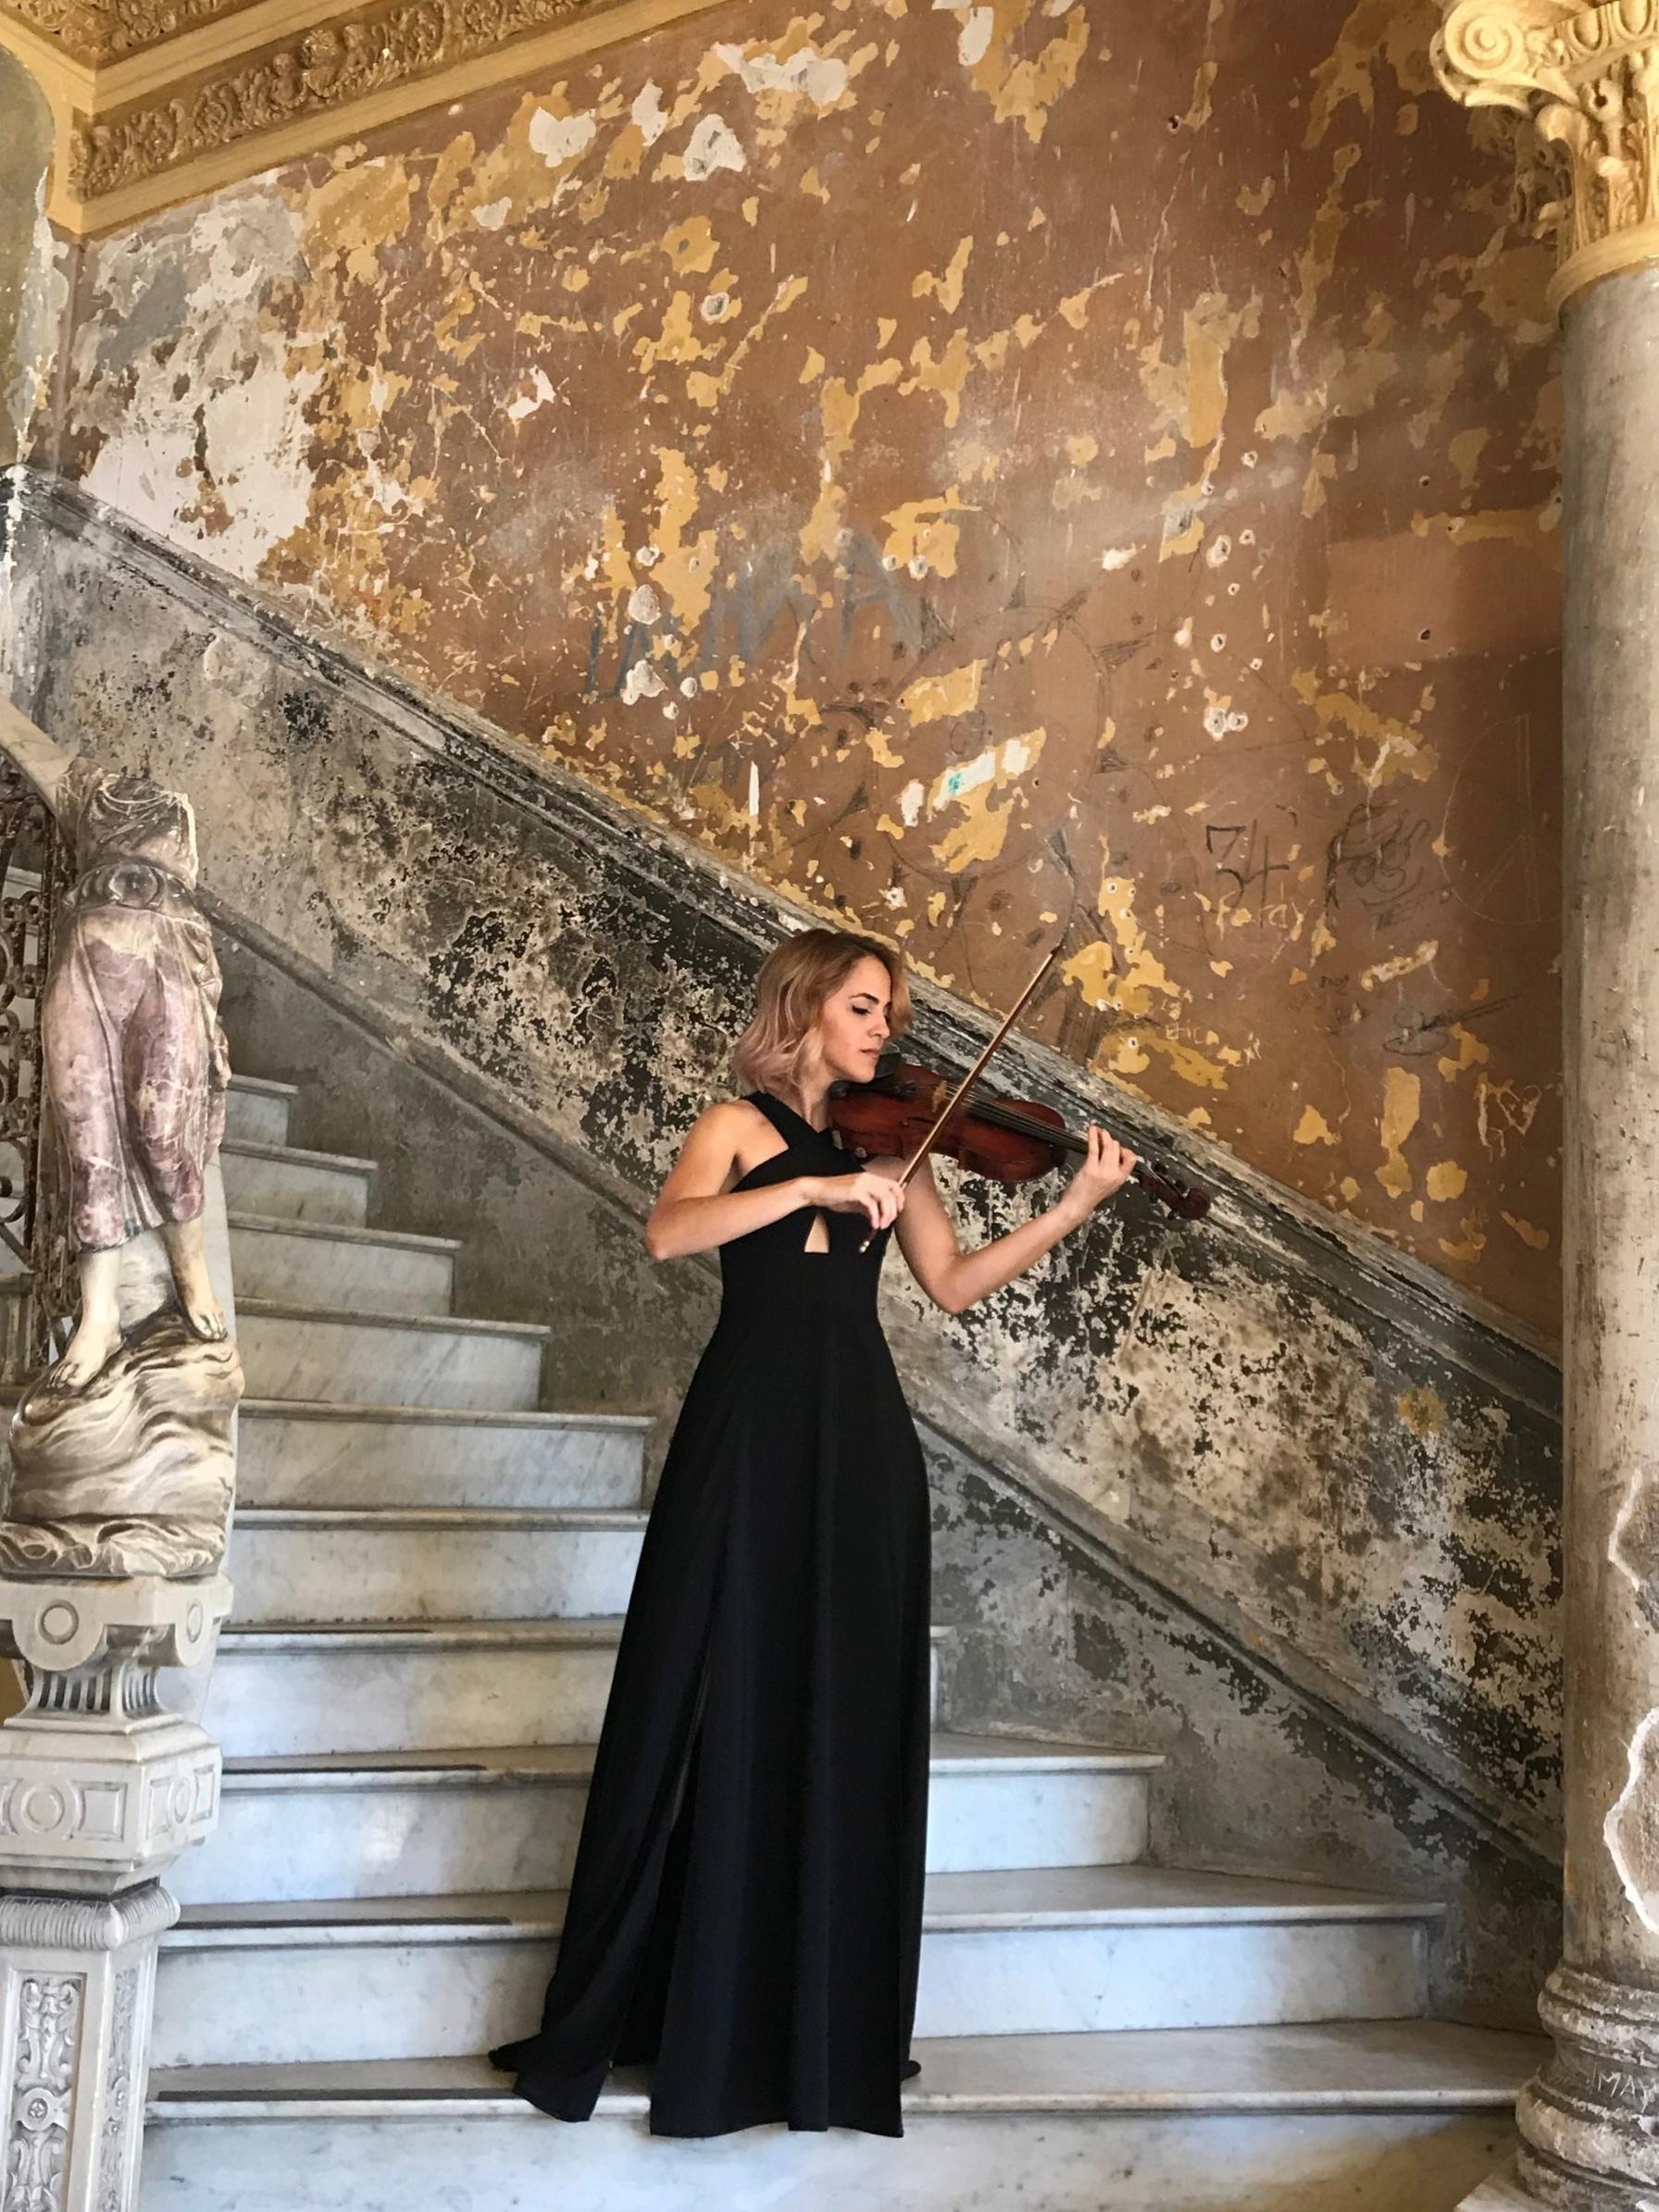 violinist guarida.jpg